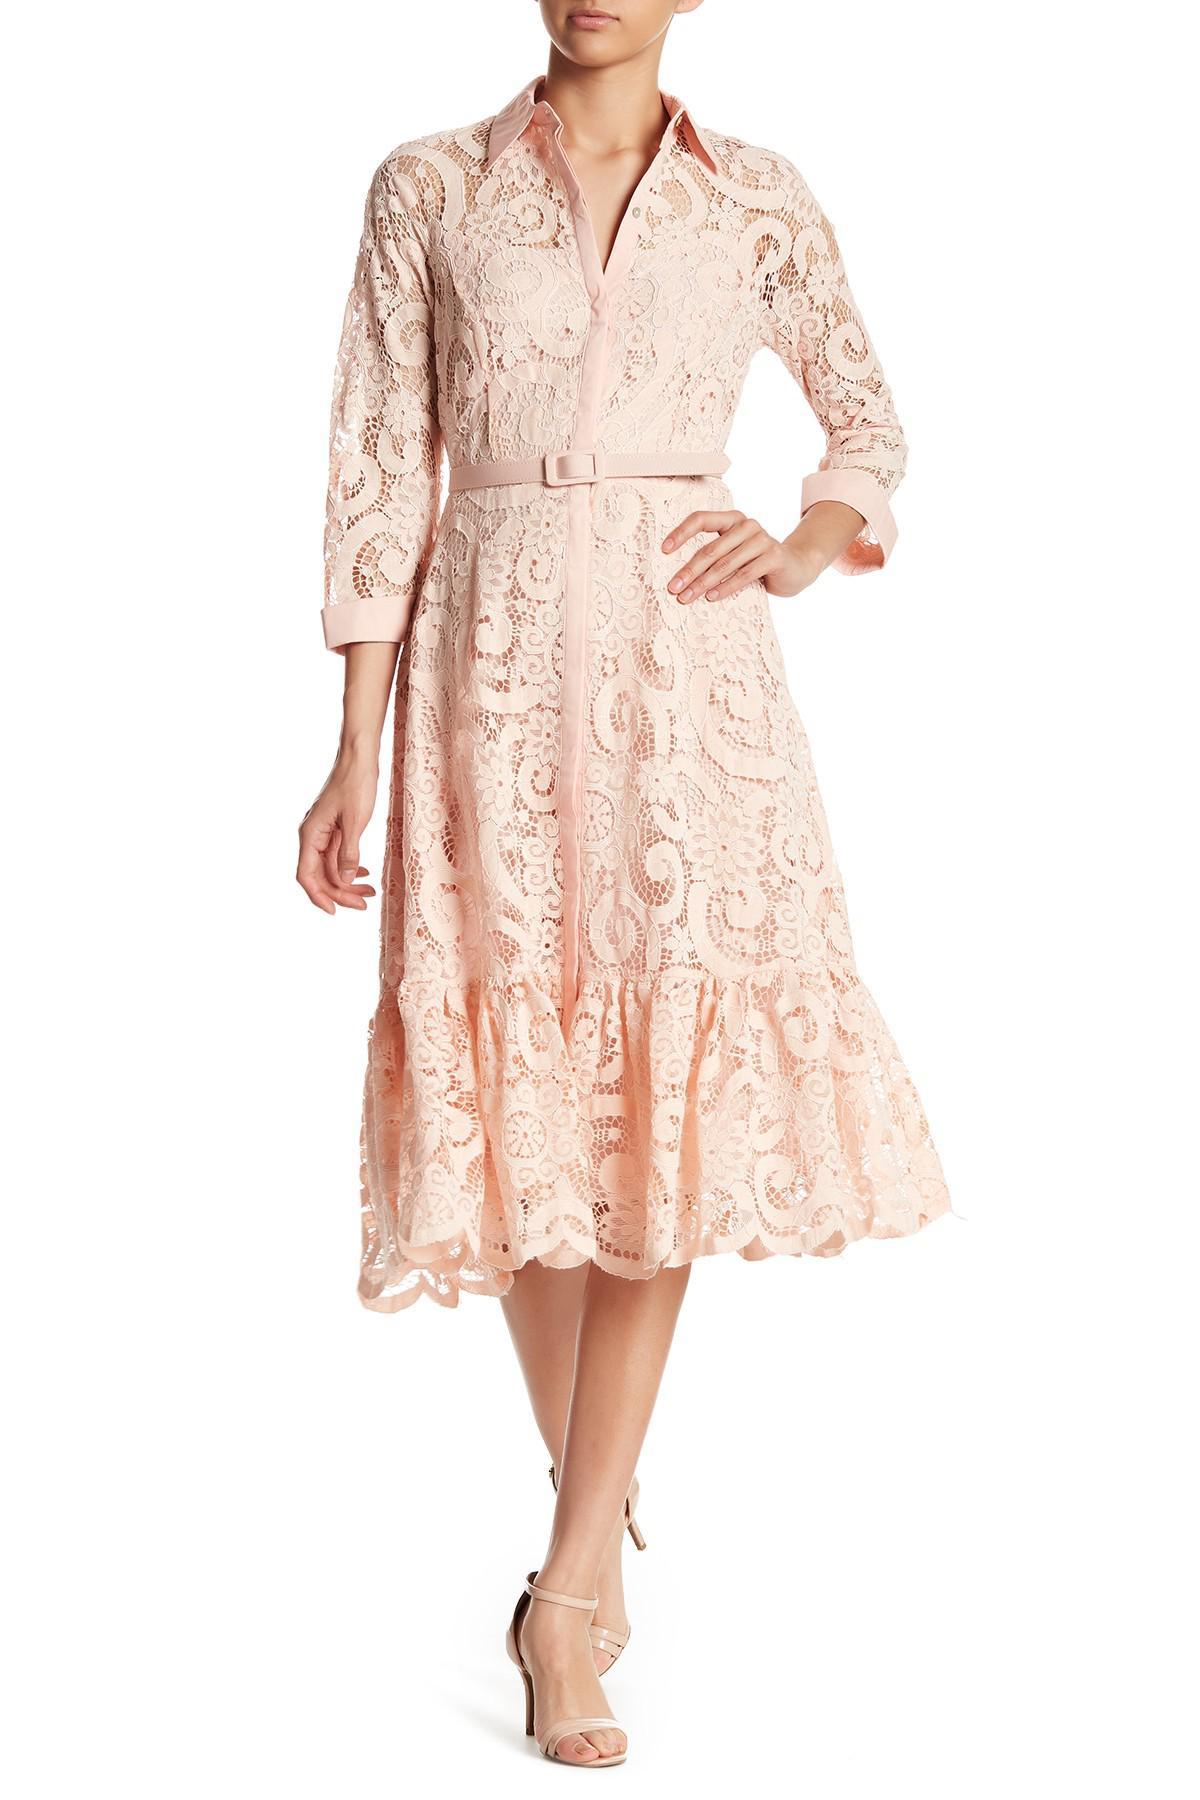 Lyst Nanette Nanette Lepore 3 4 Sleeve Lace Shirt Dress